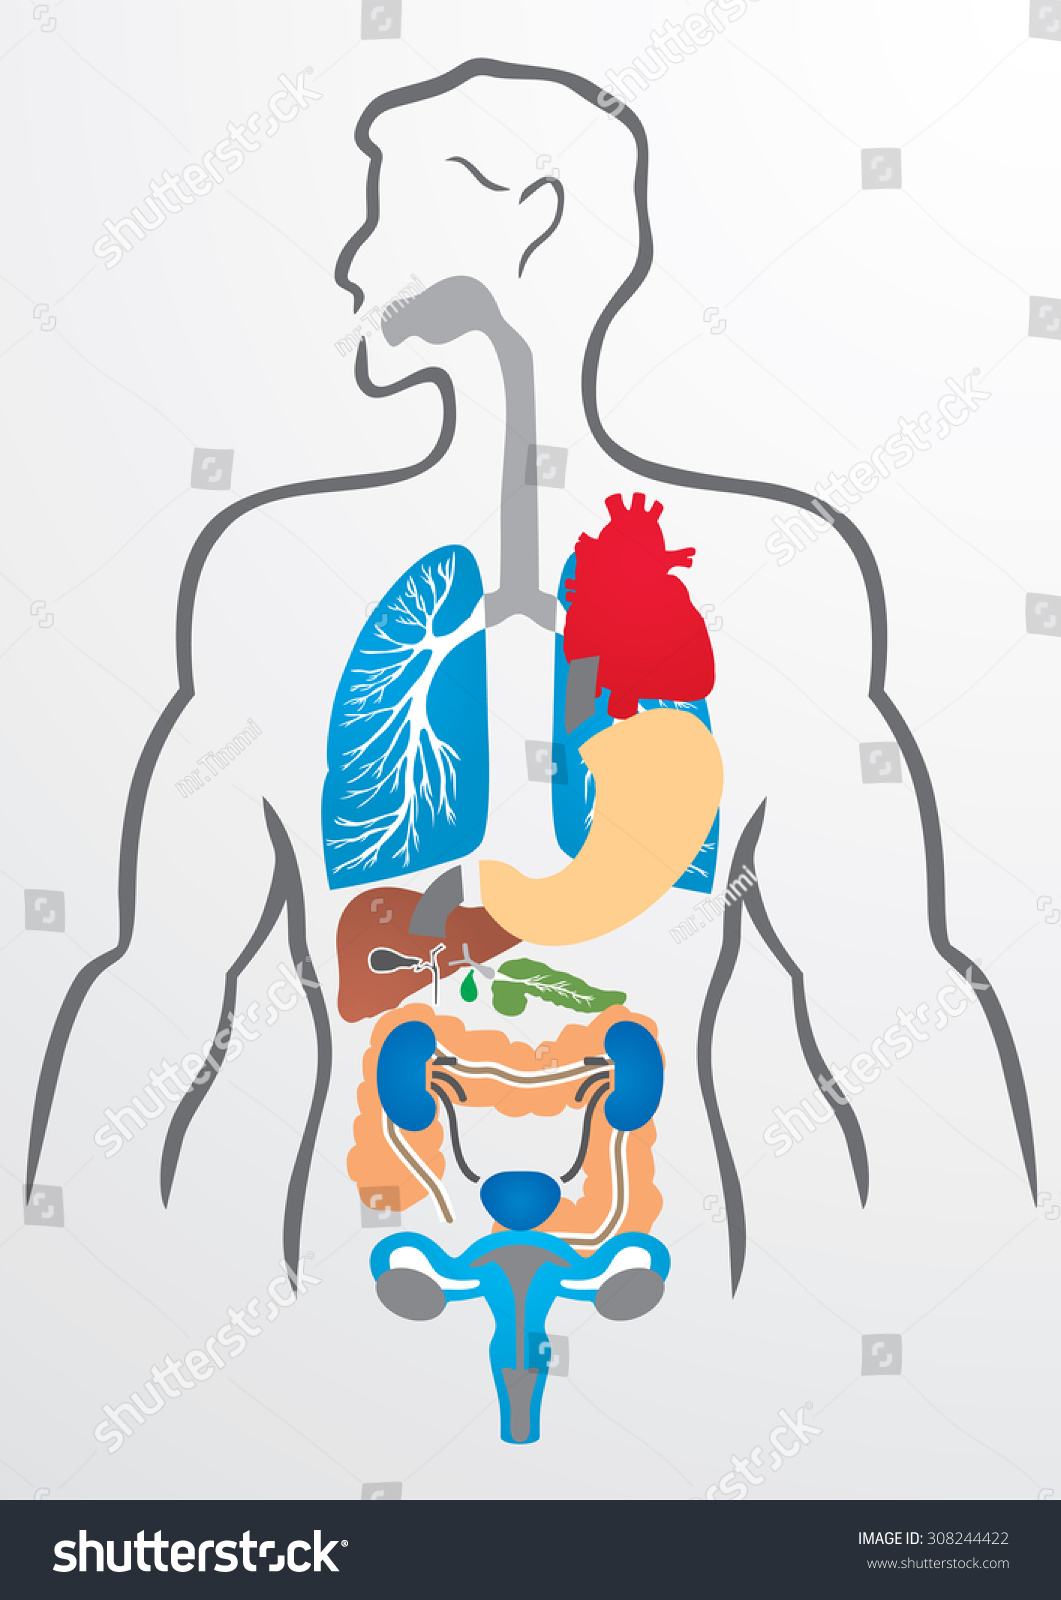 Human Organs Human Body Illustration Stock Vector (Royalty Free ...